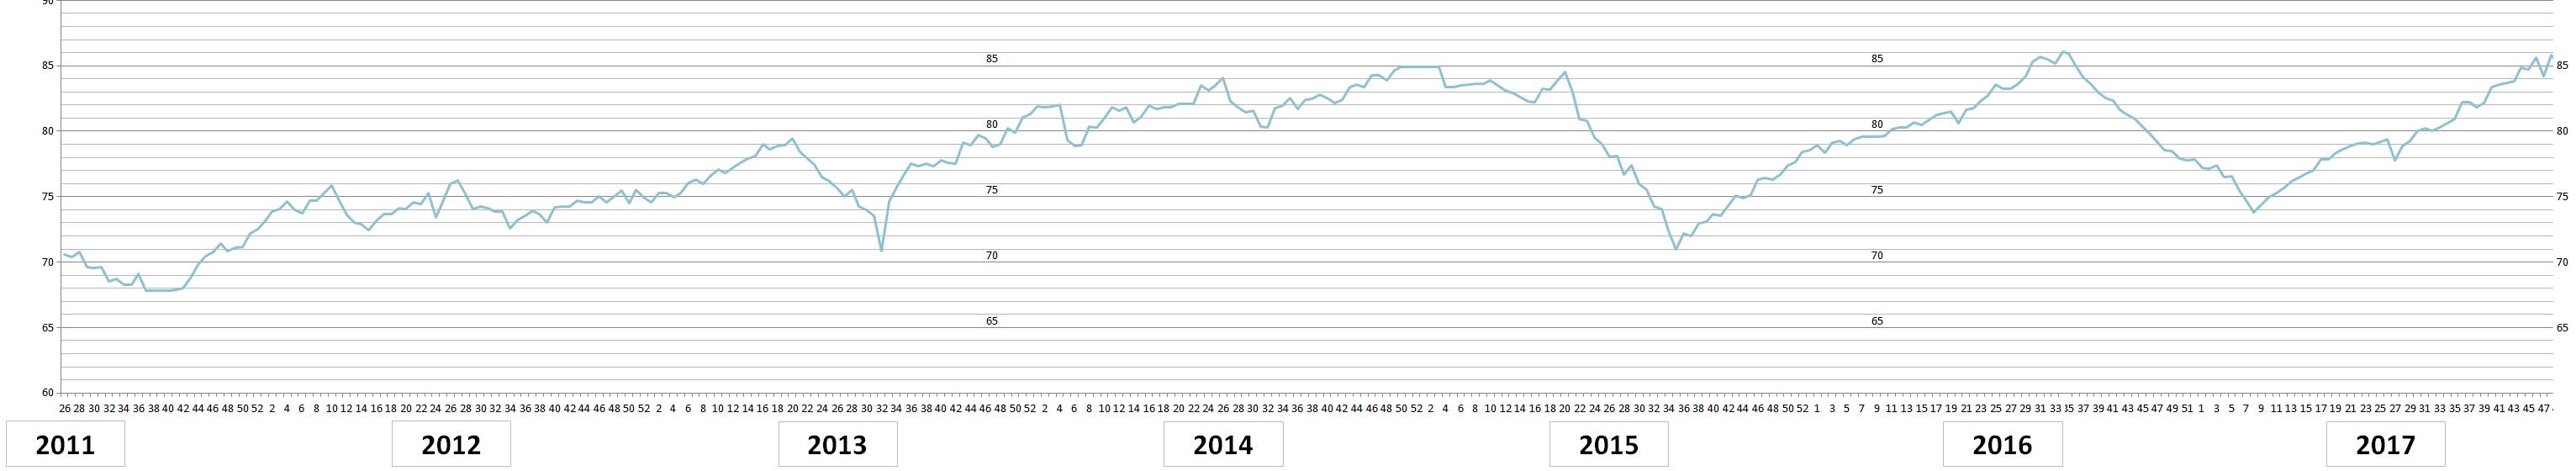 Painon kehitys vuosina 2011-2017